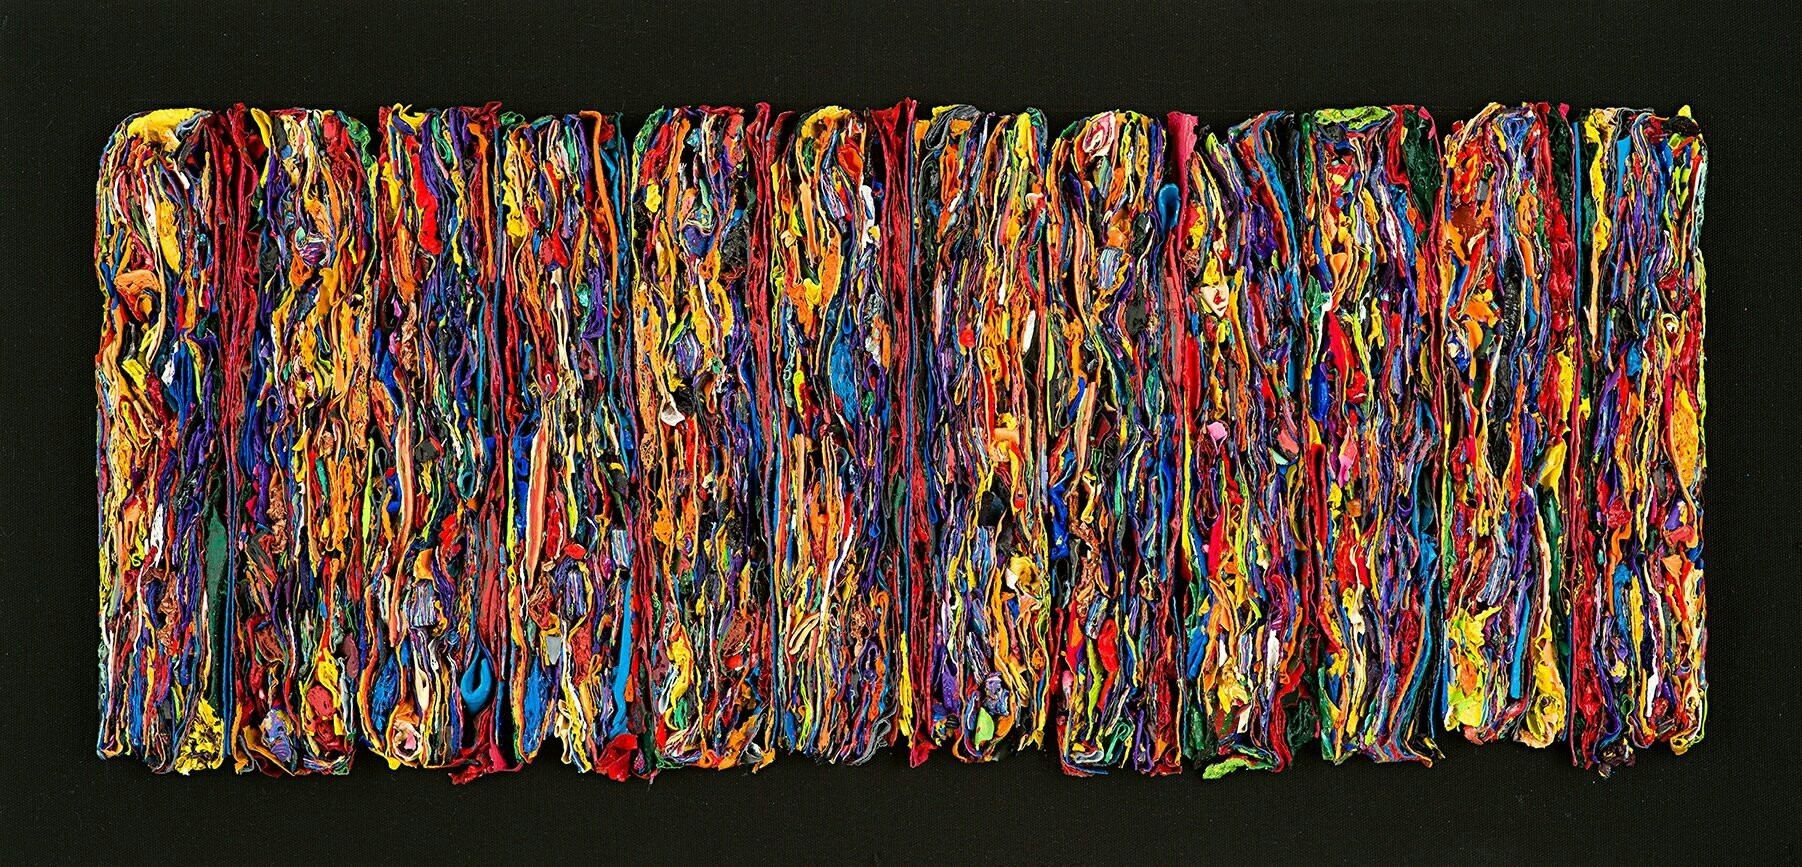 Kwon Kija, Time accumulation, 2019, Acrylic on panel, 50 x 120 cm, $7,000